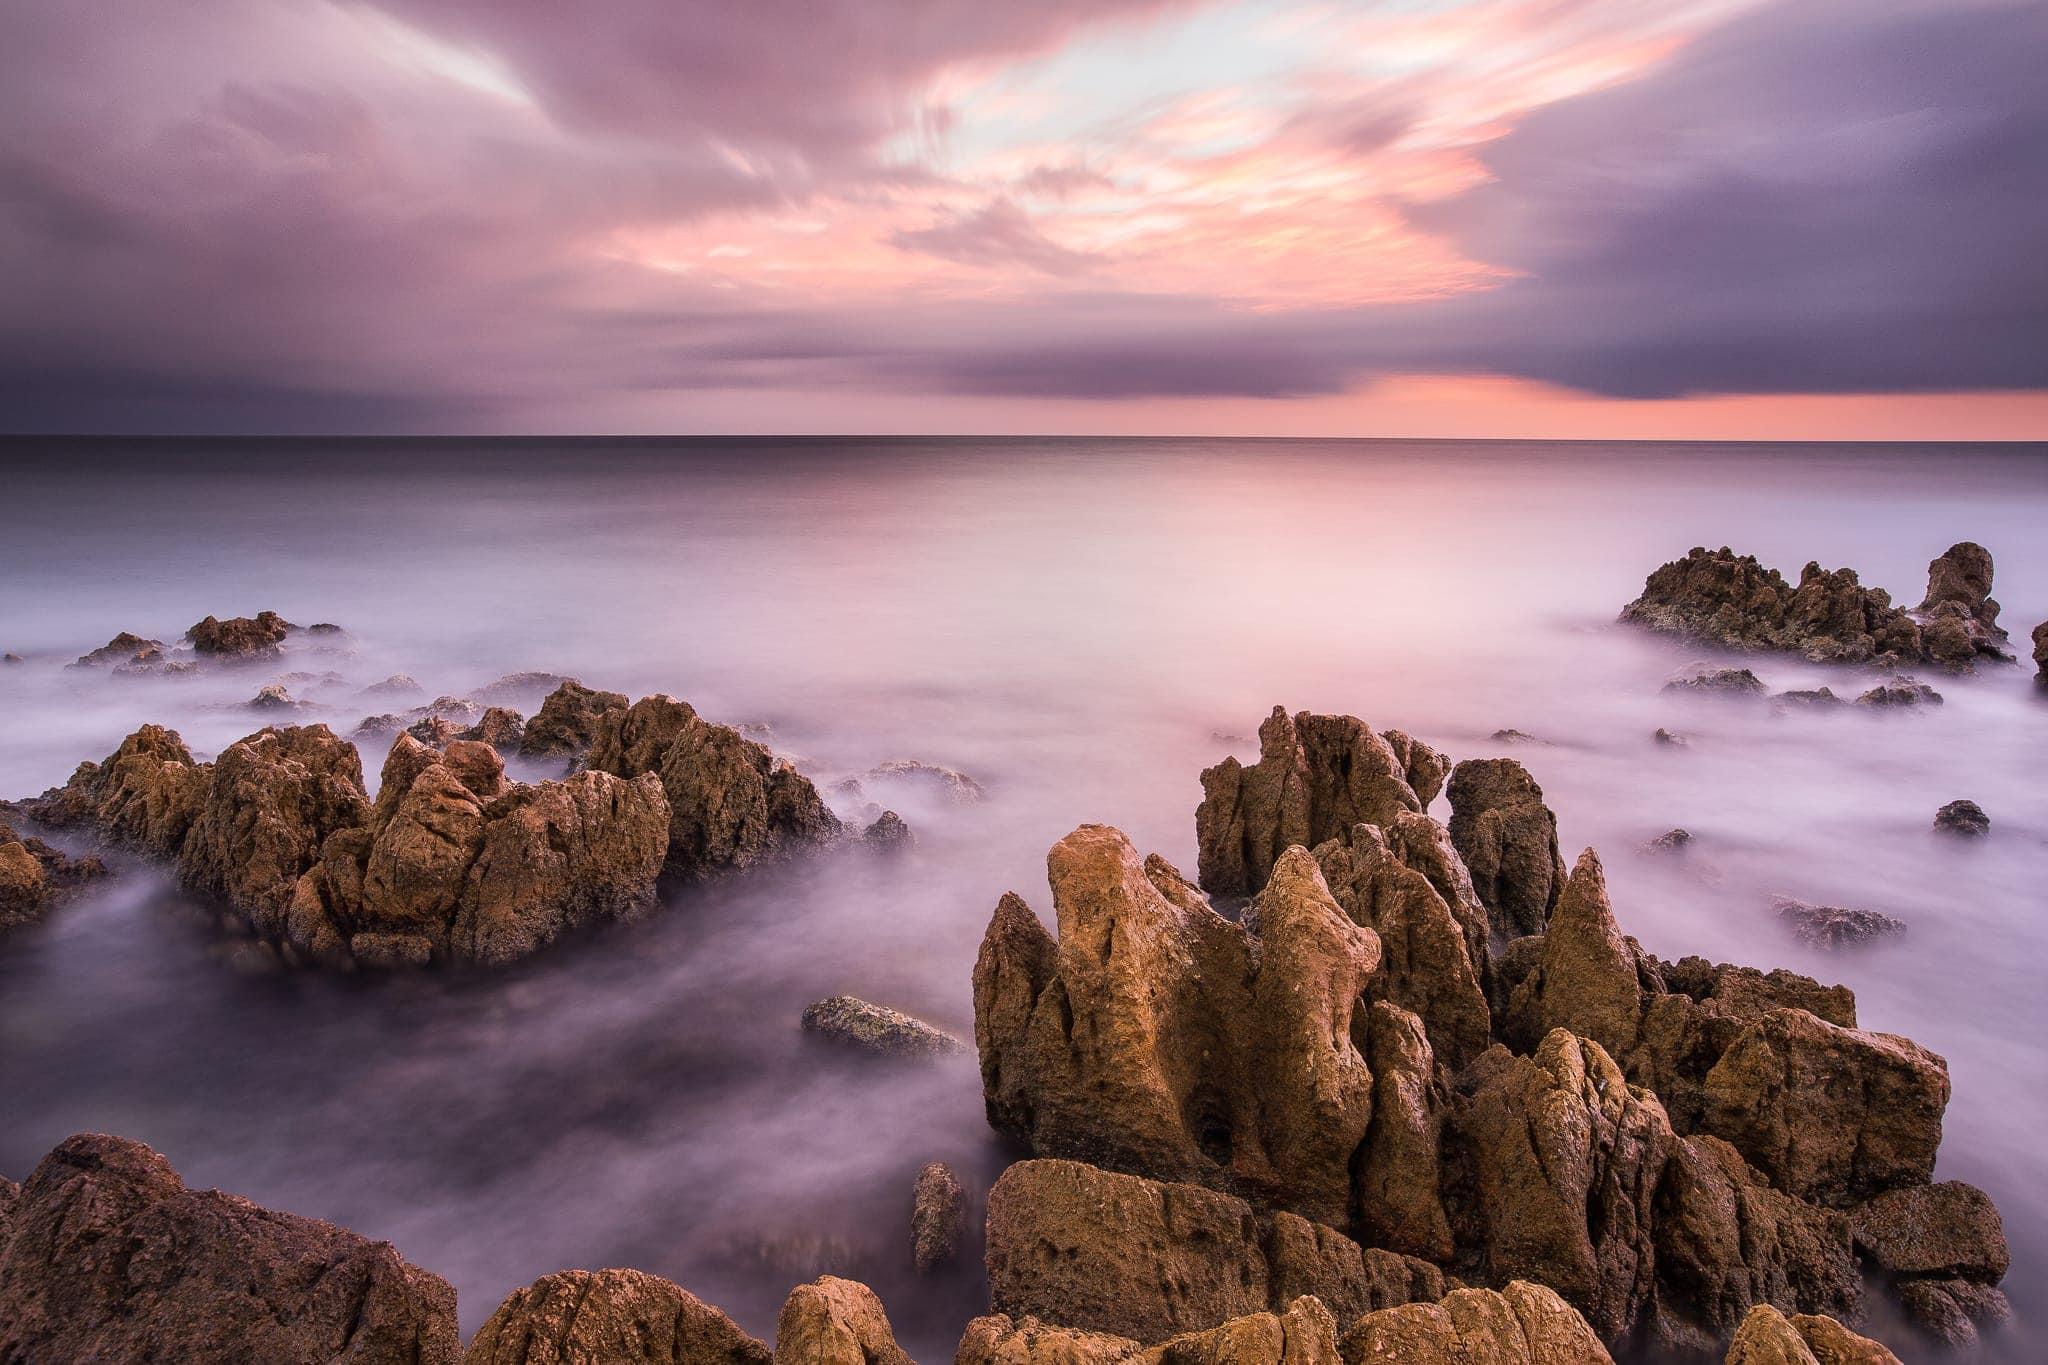 Francesco Gola Seascape Landscape Photography Long Exposure France Cote Azur Sunrise Antibe